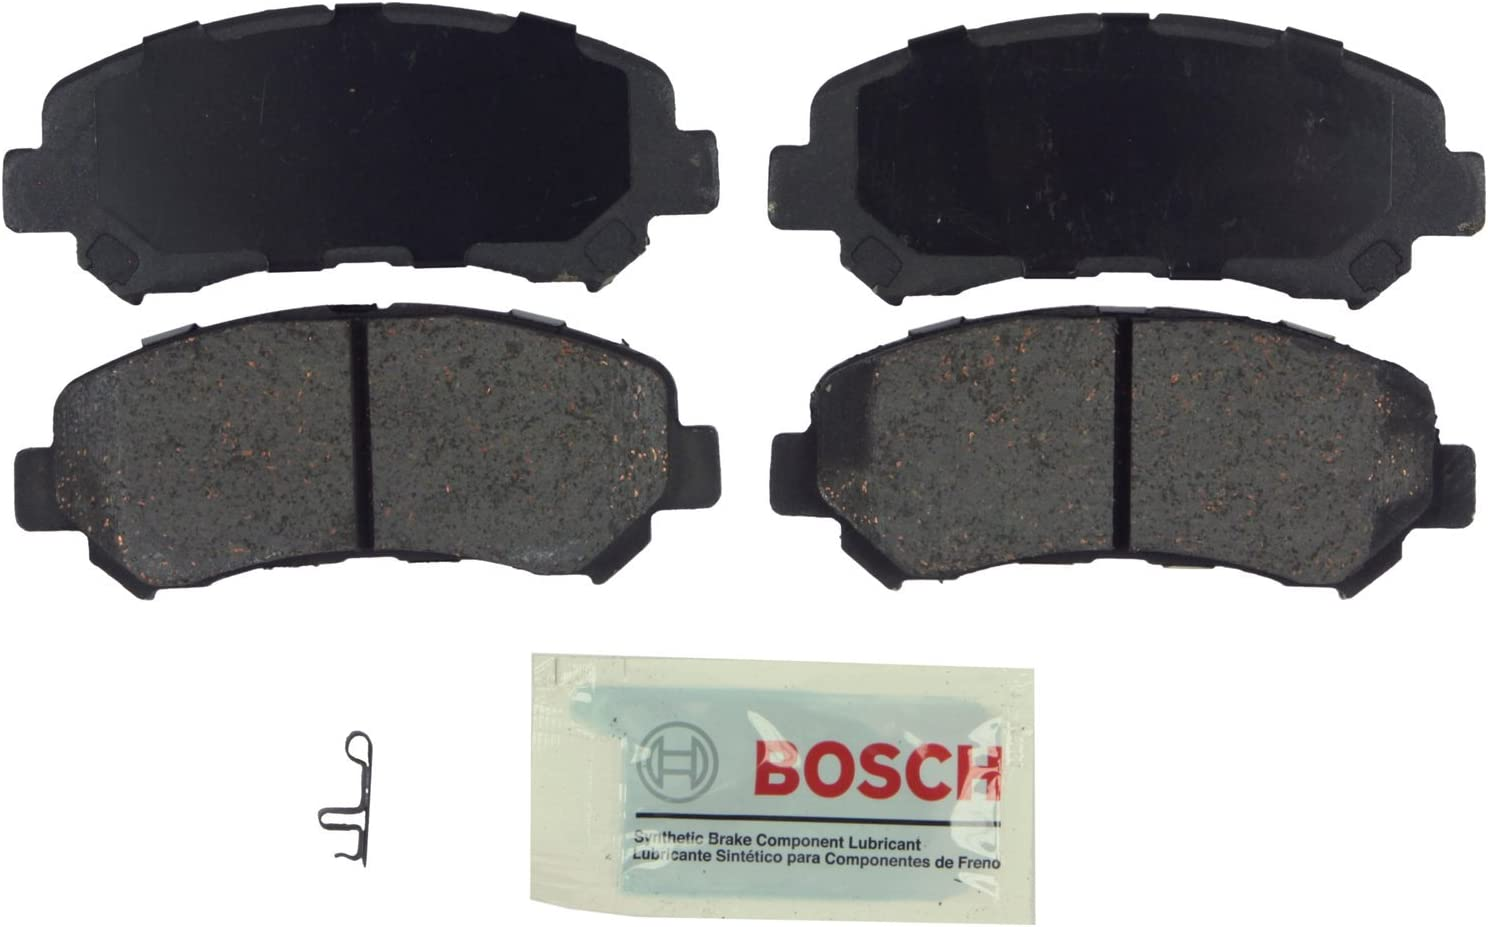 Front Disc Brake Pad Set Bosch QuietCast BP1338 Fits Nissan Maxima Rogue Suzuki